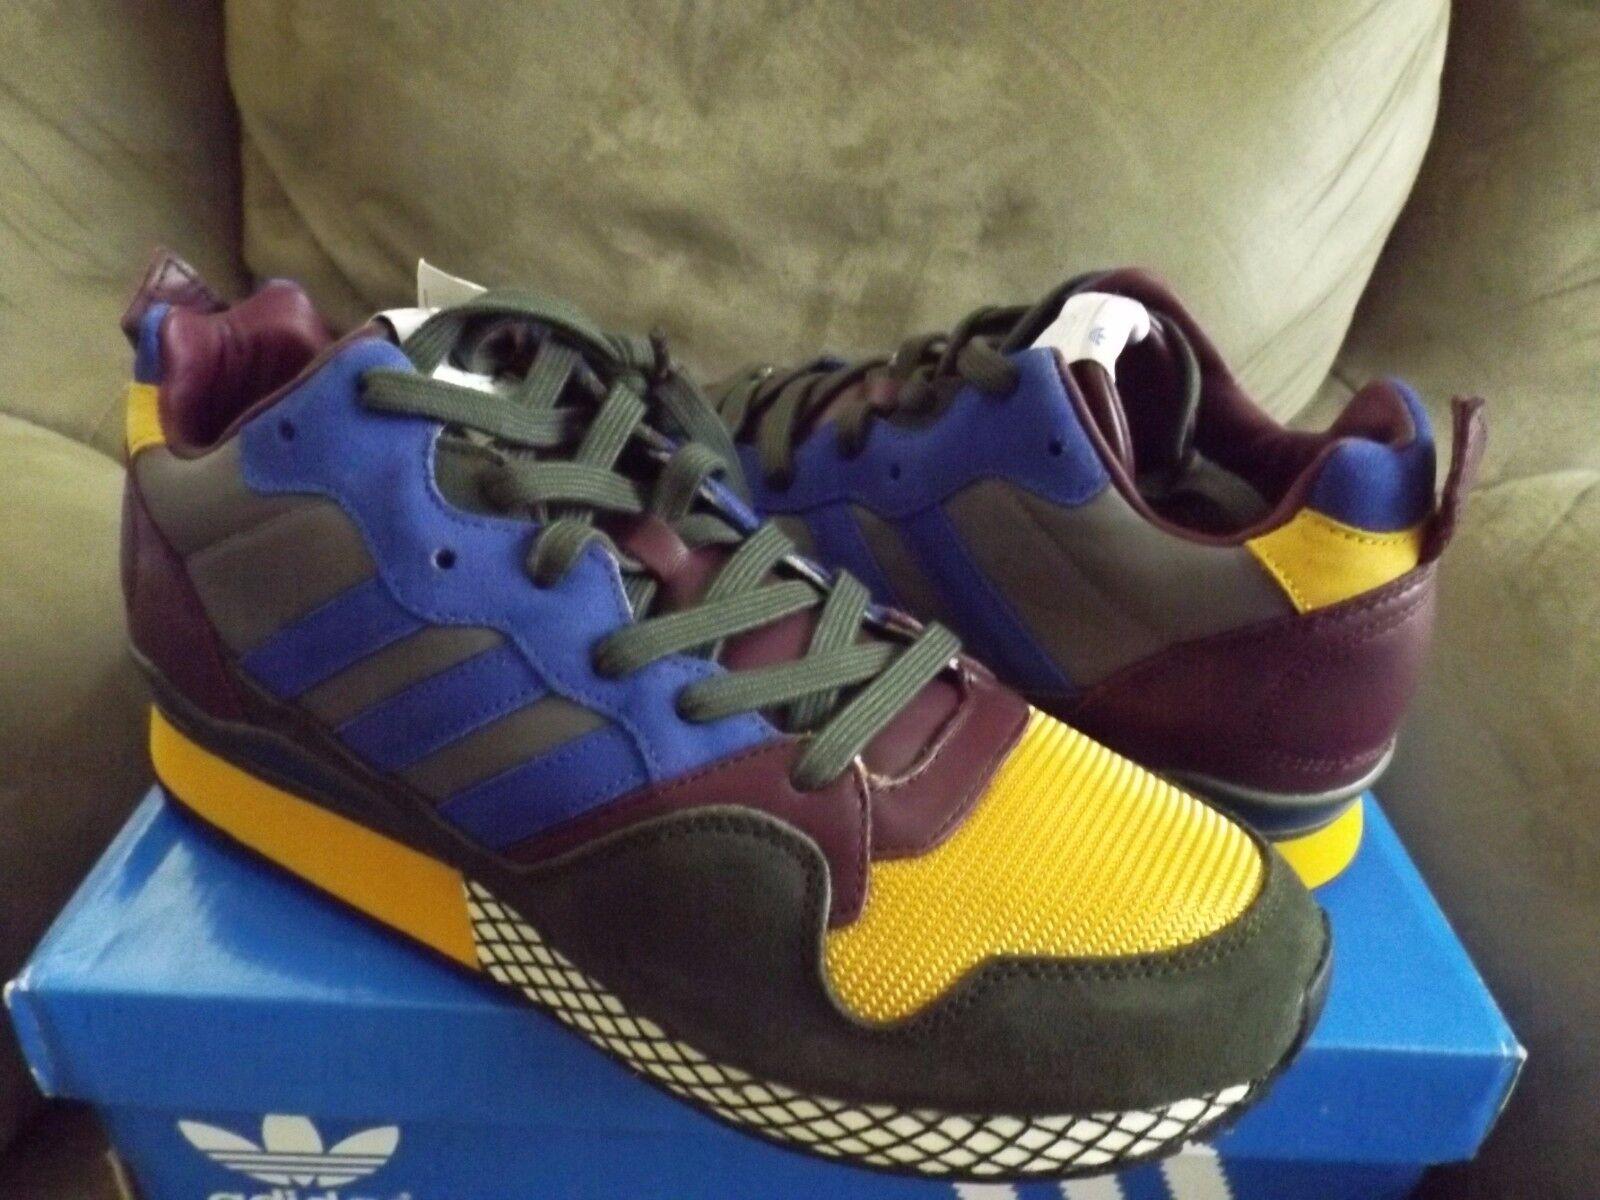 Adidas ZXZ 930 84-Lab Men's Sneakers STOGRE/POBLUE/LBone M25790 New with Box